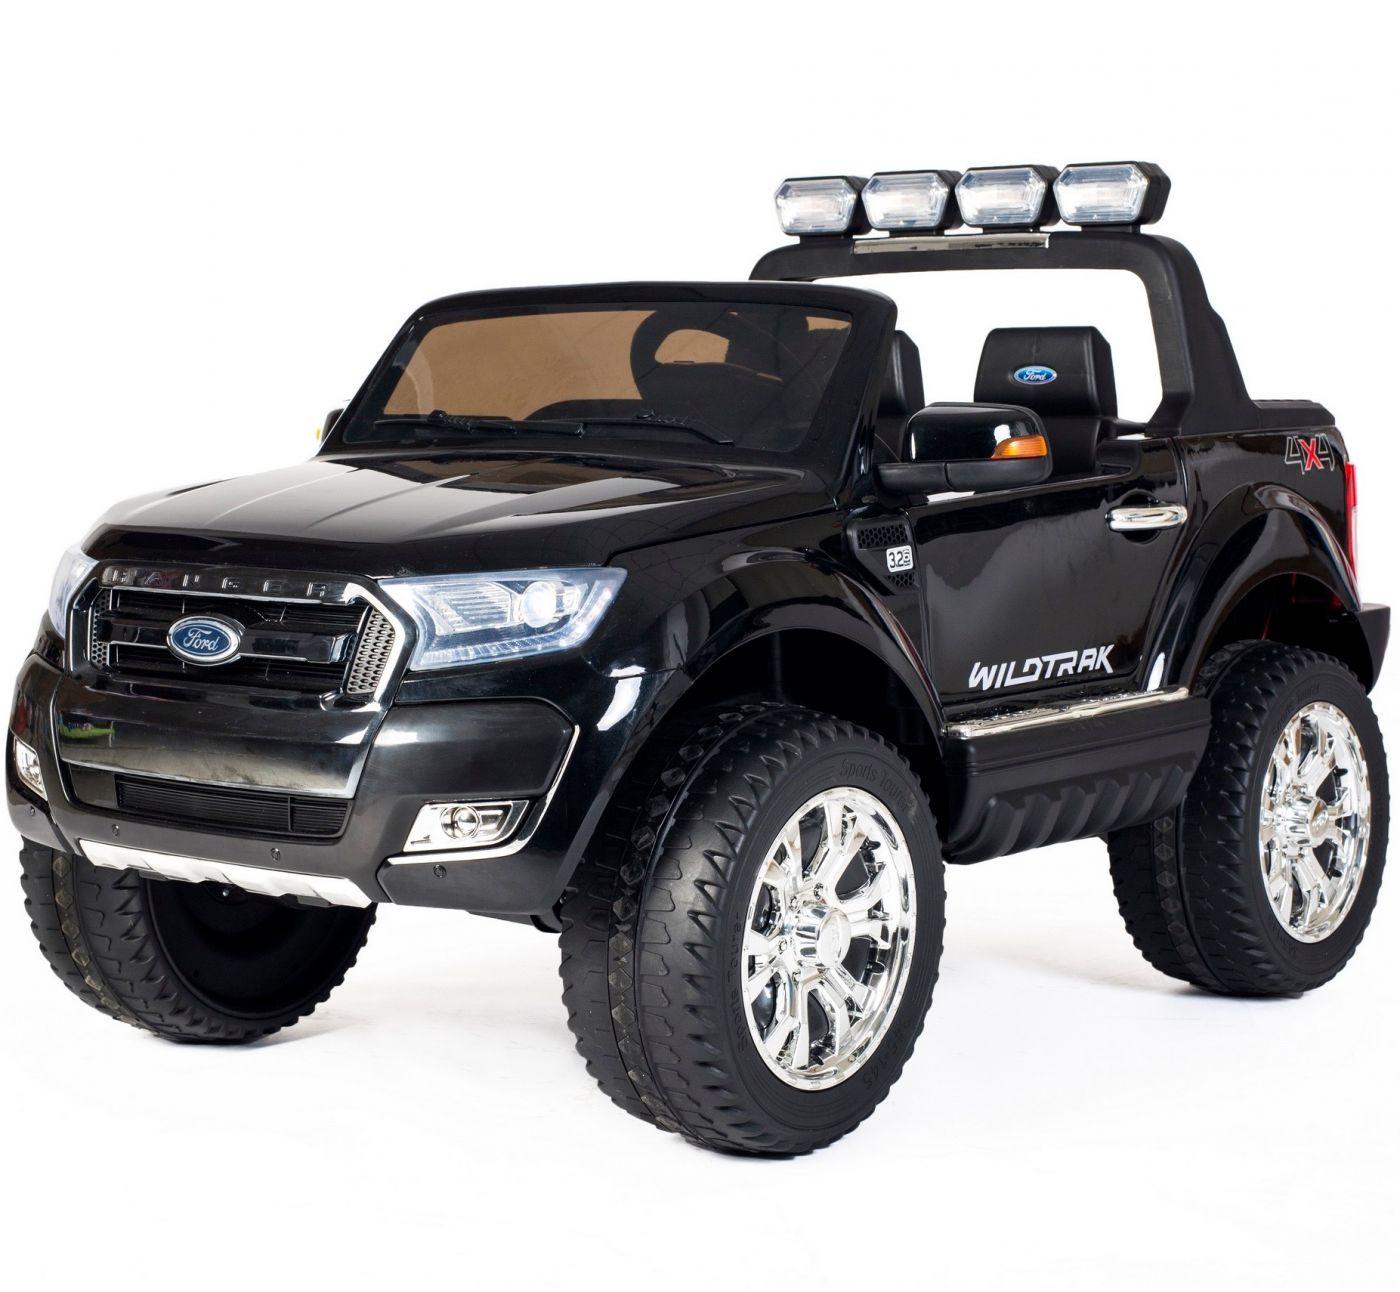 24v Ride On Ford Ranger Wildtrak 4wd Black